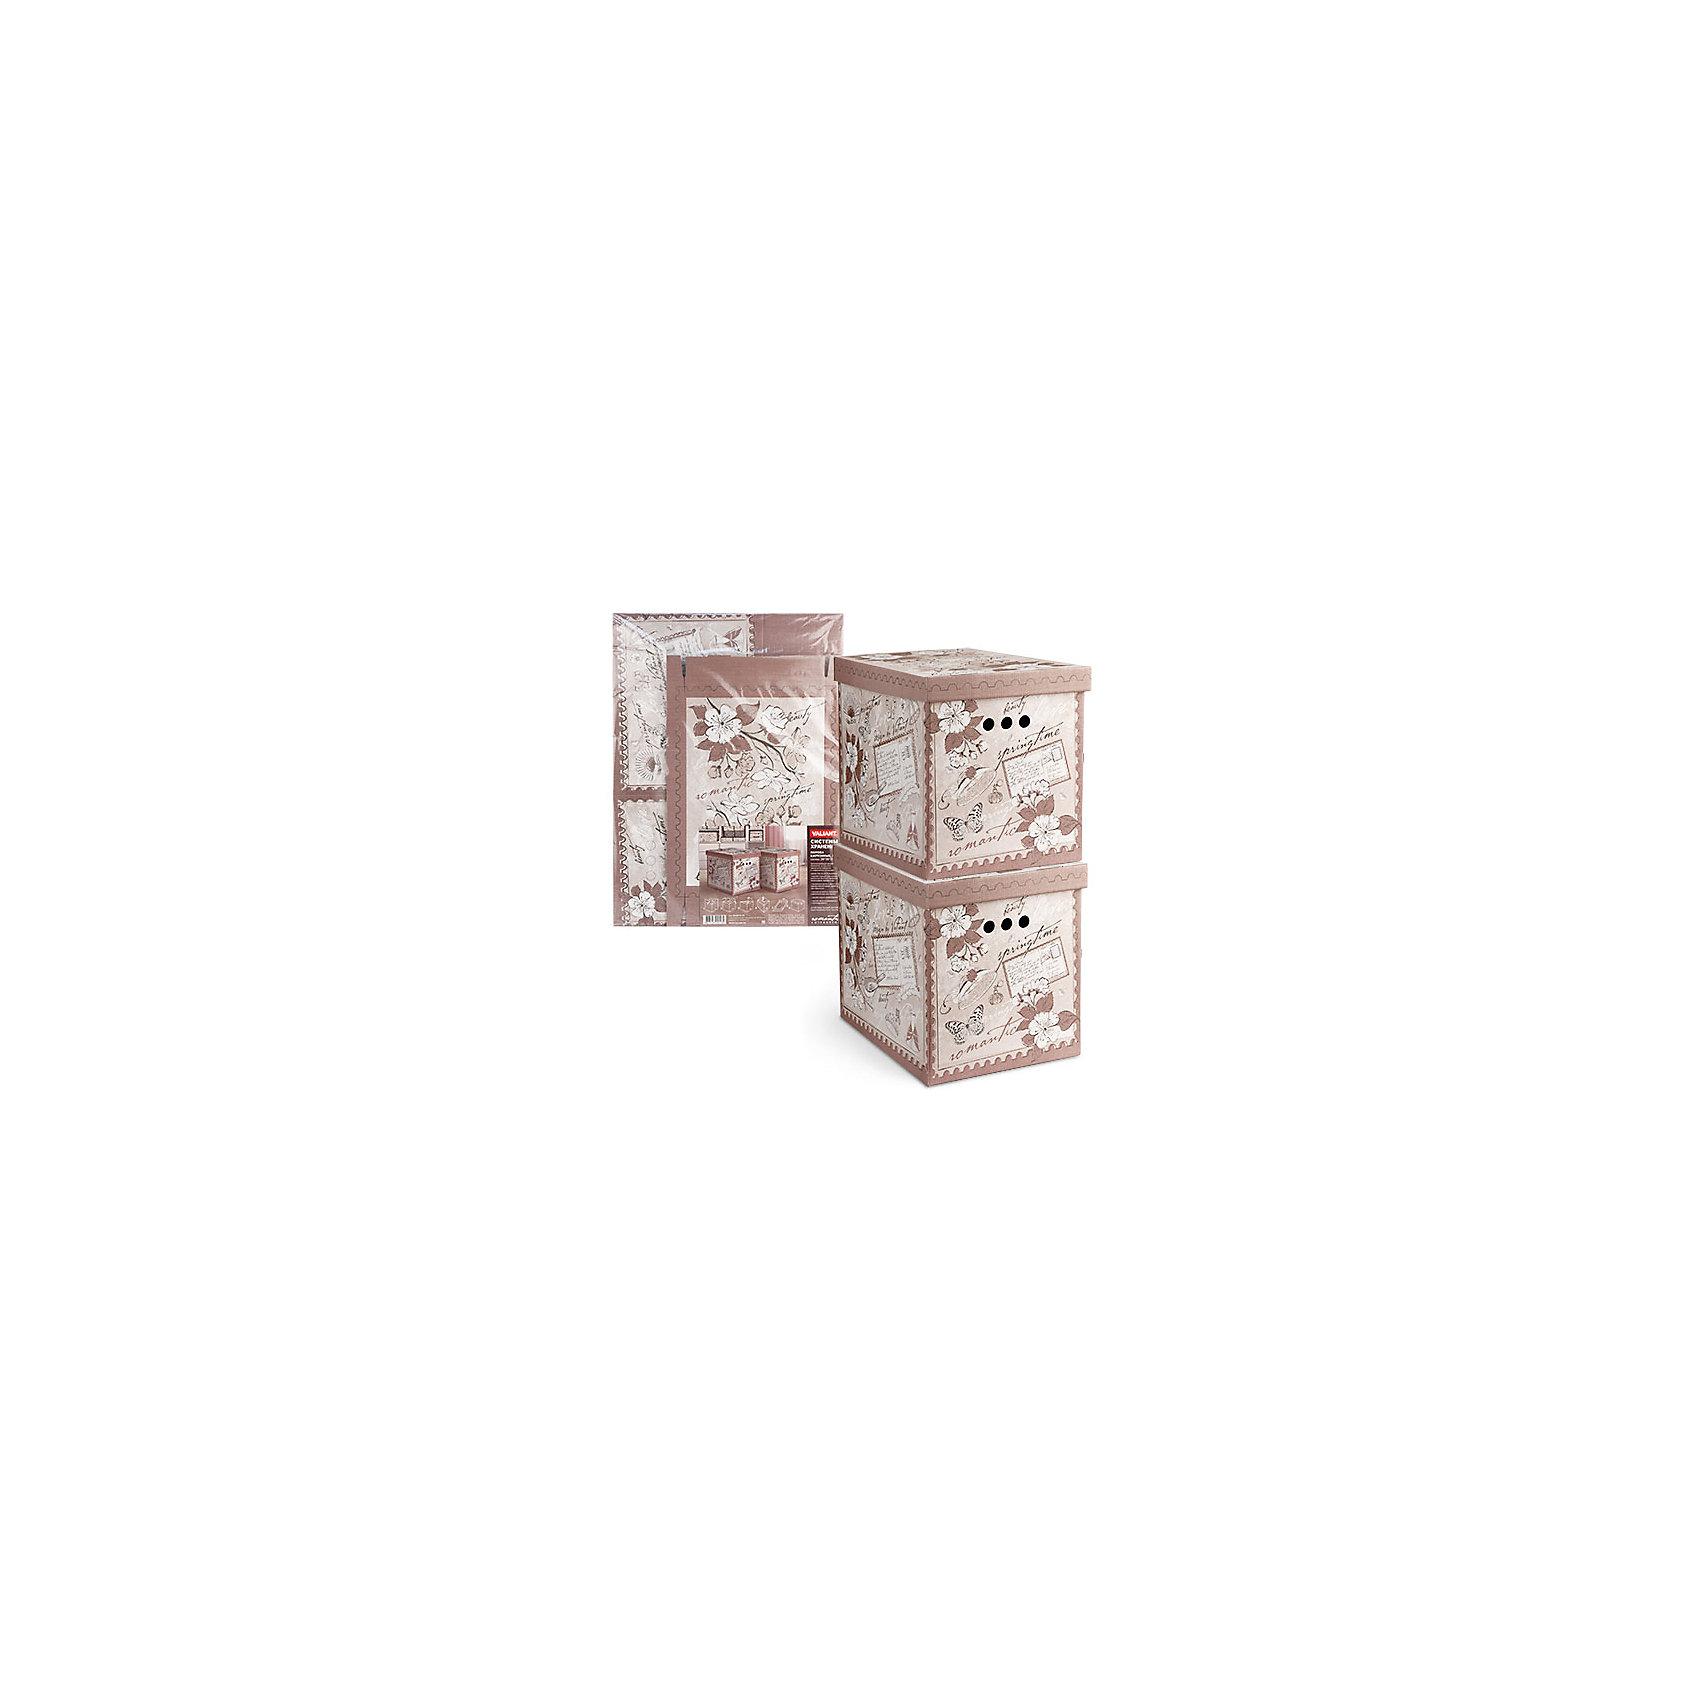 VALIANT Короб картонный, складной, большой, 28*38*31.5 см, 2 шт., ROMANTIC, Valiant